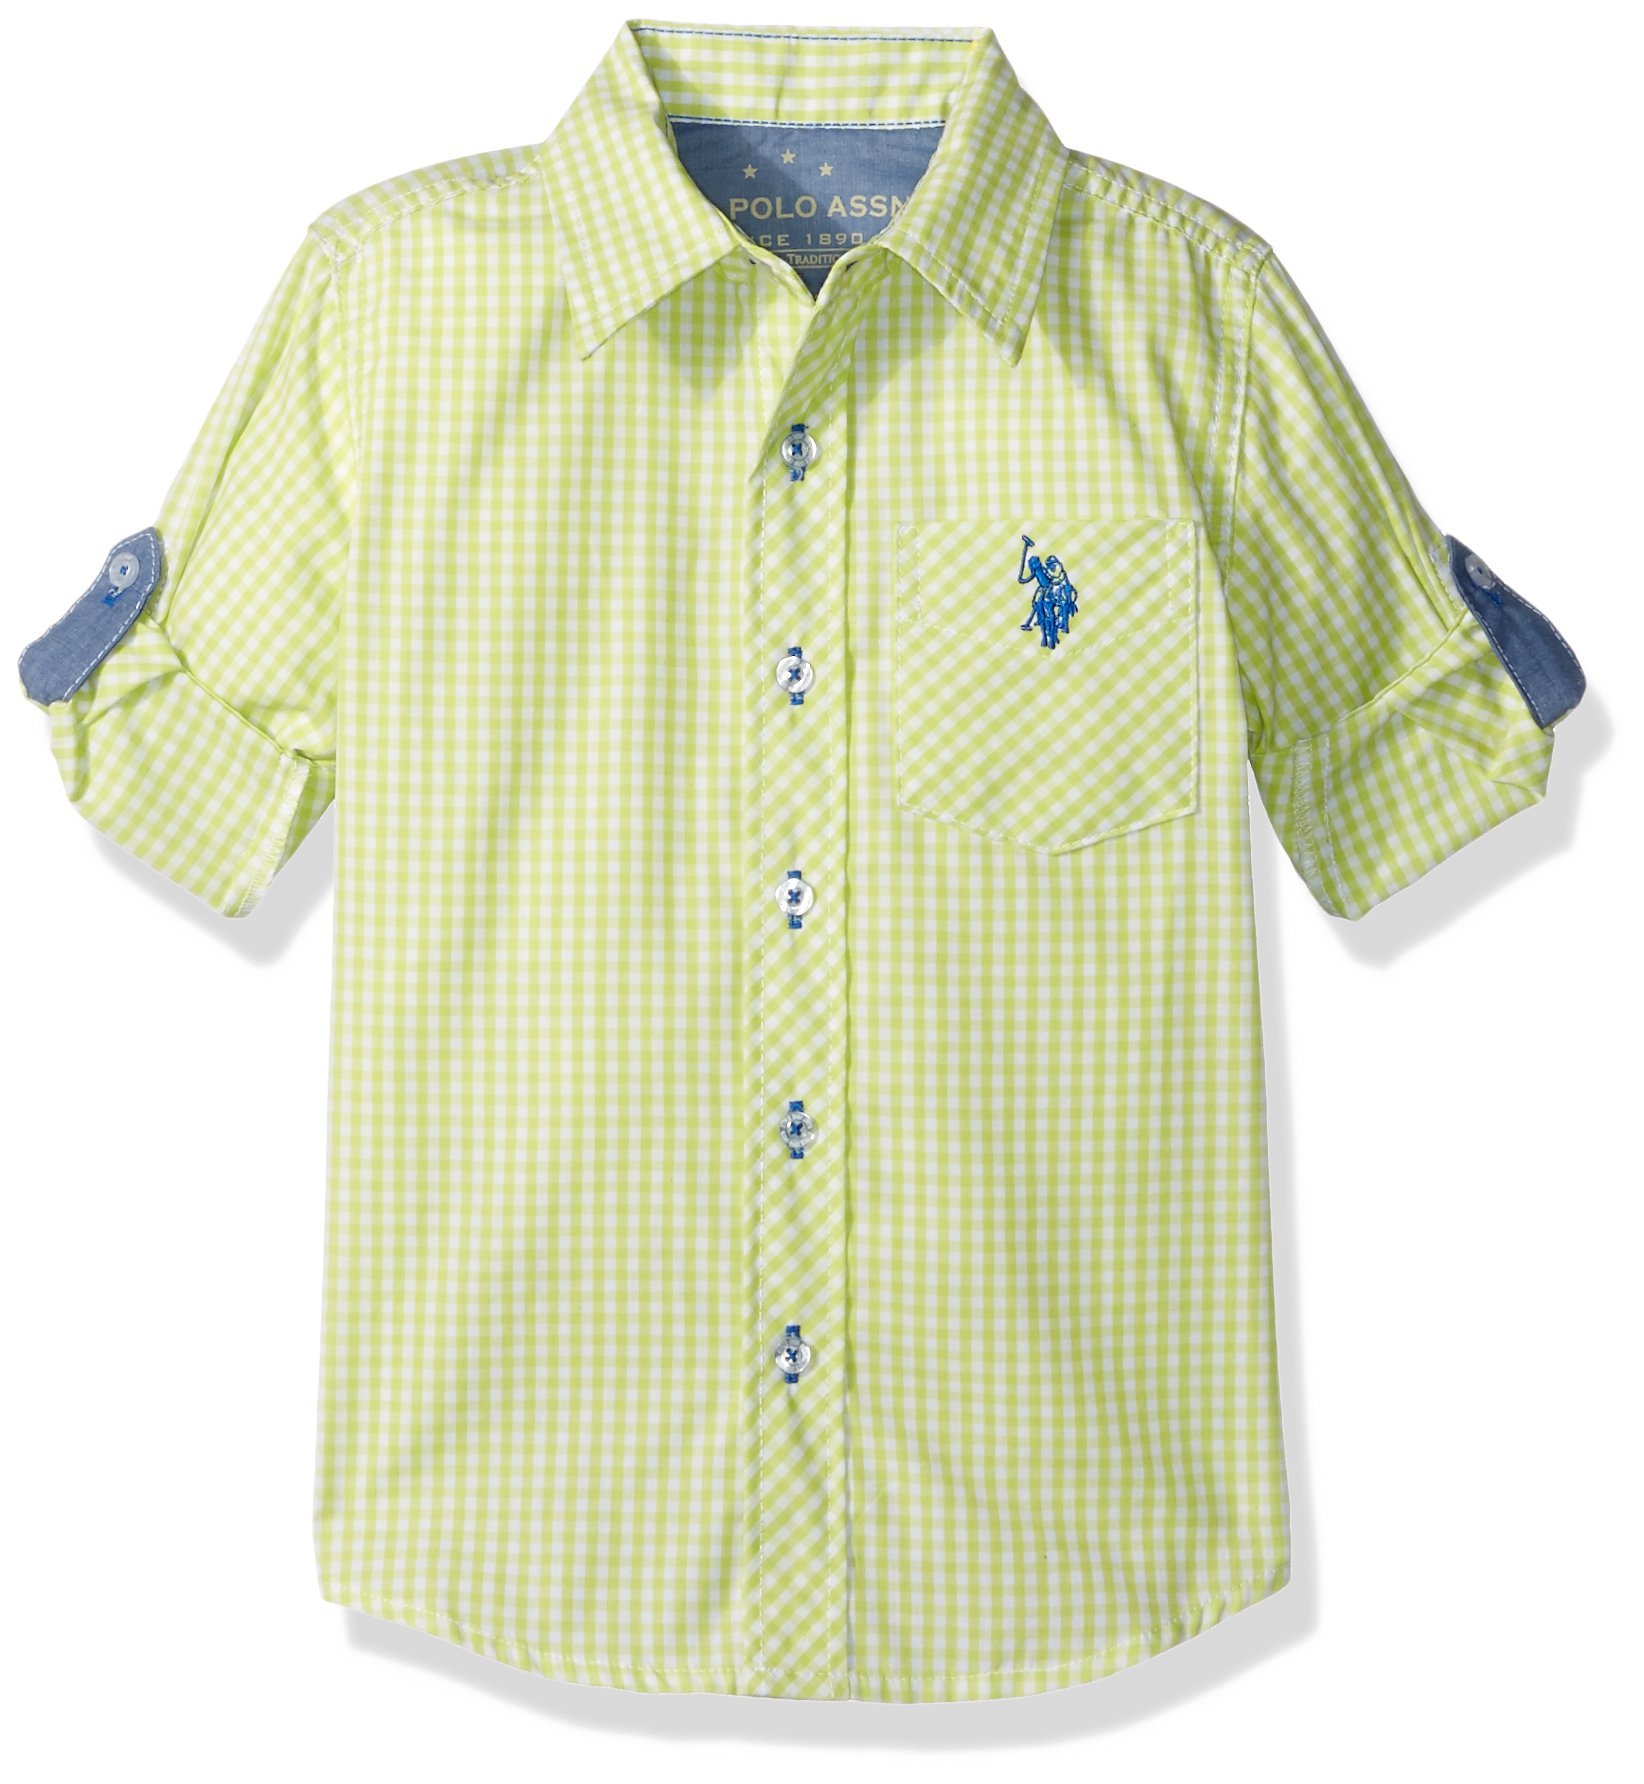 U.S. Polo Assn. Boys' Long Sleeve Plaid Or Check Cotton Sport Shirt